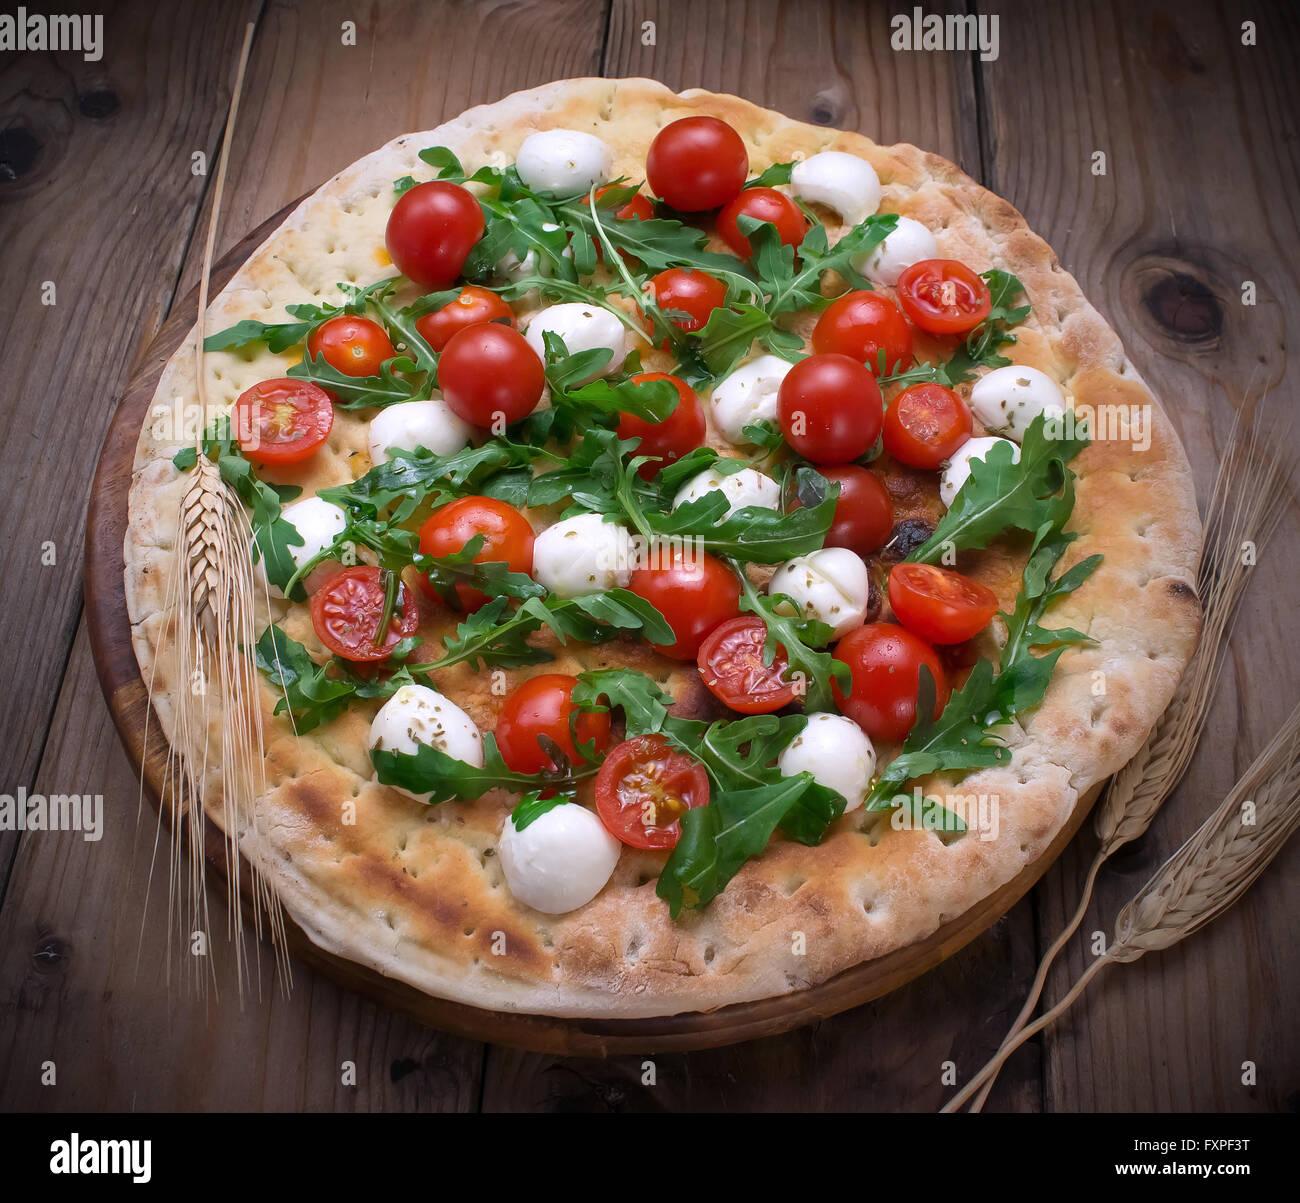 Italian focaccia with fresh organic cherry tomatoes and rocket salad - Stock Image